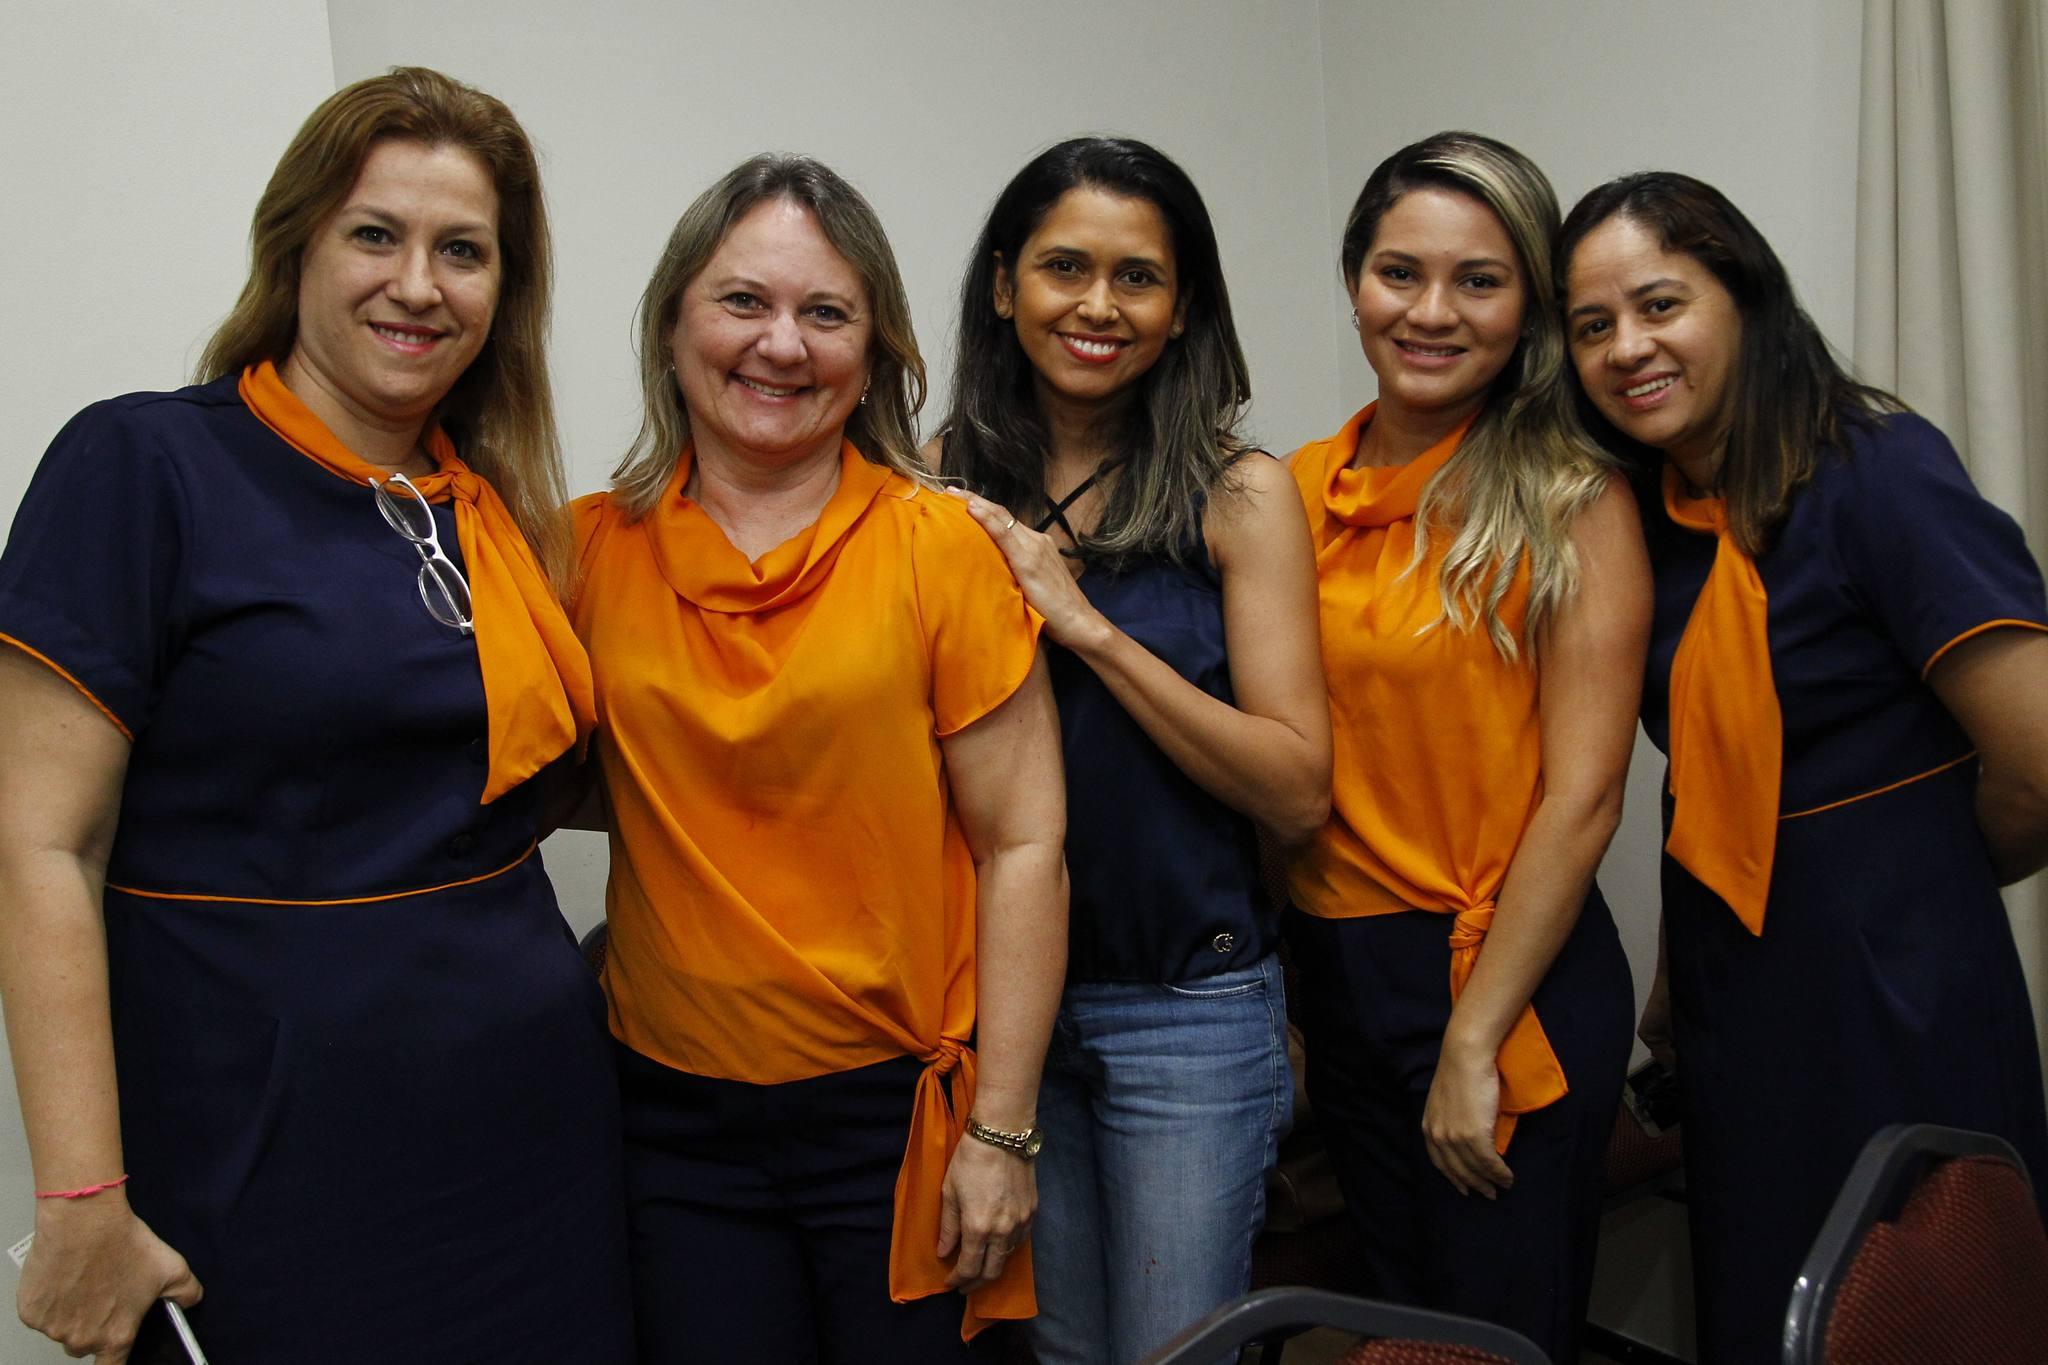 Evelize Lima, Diana Dagenes, Mara Fluvia, Glauciane E Meire Oliveira